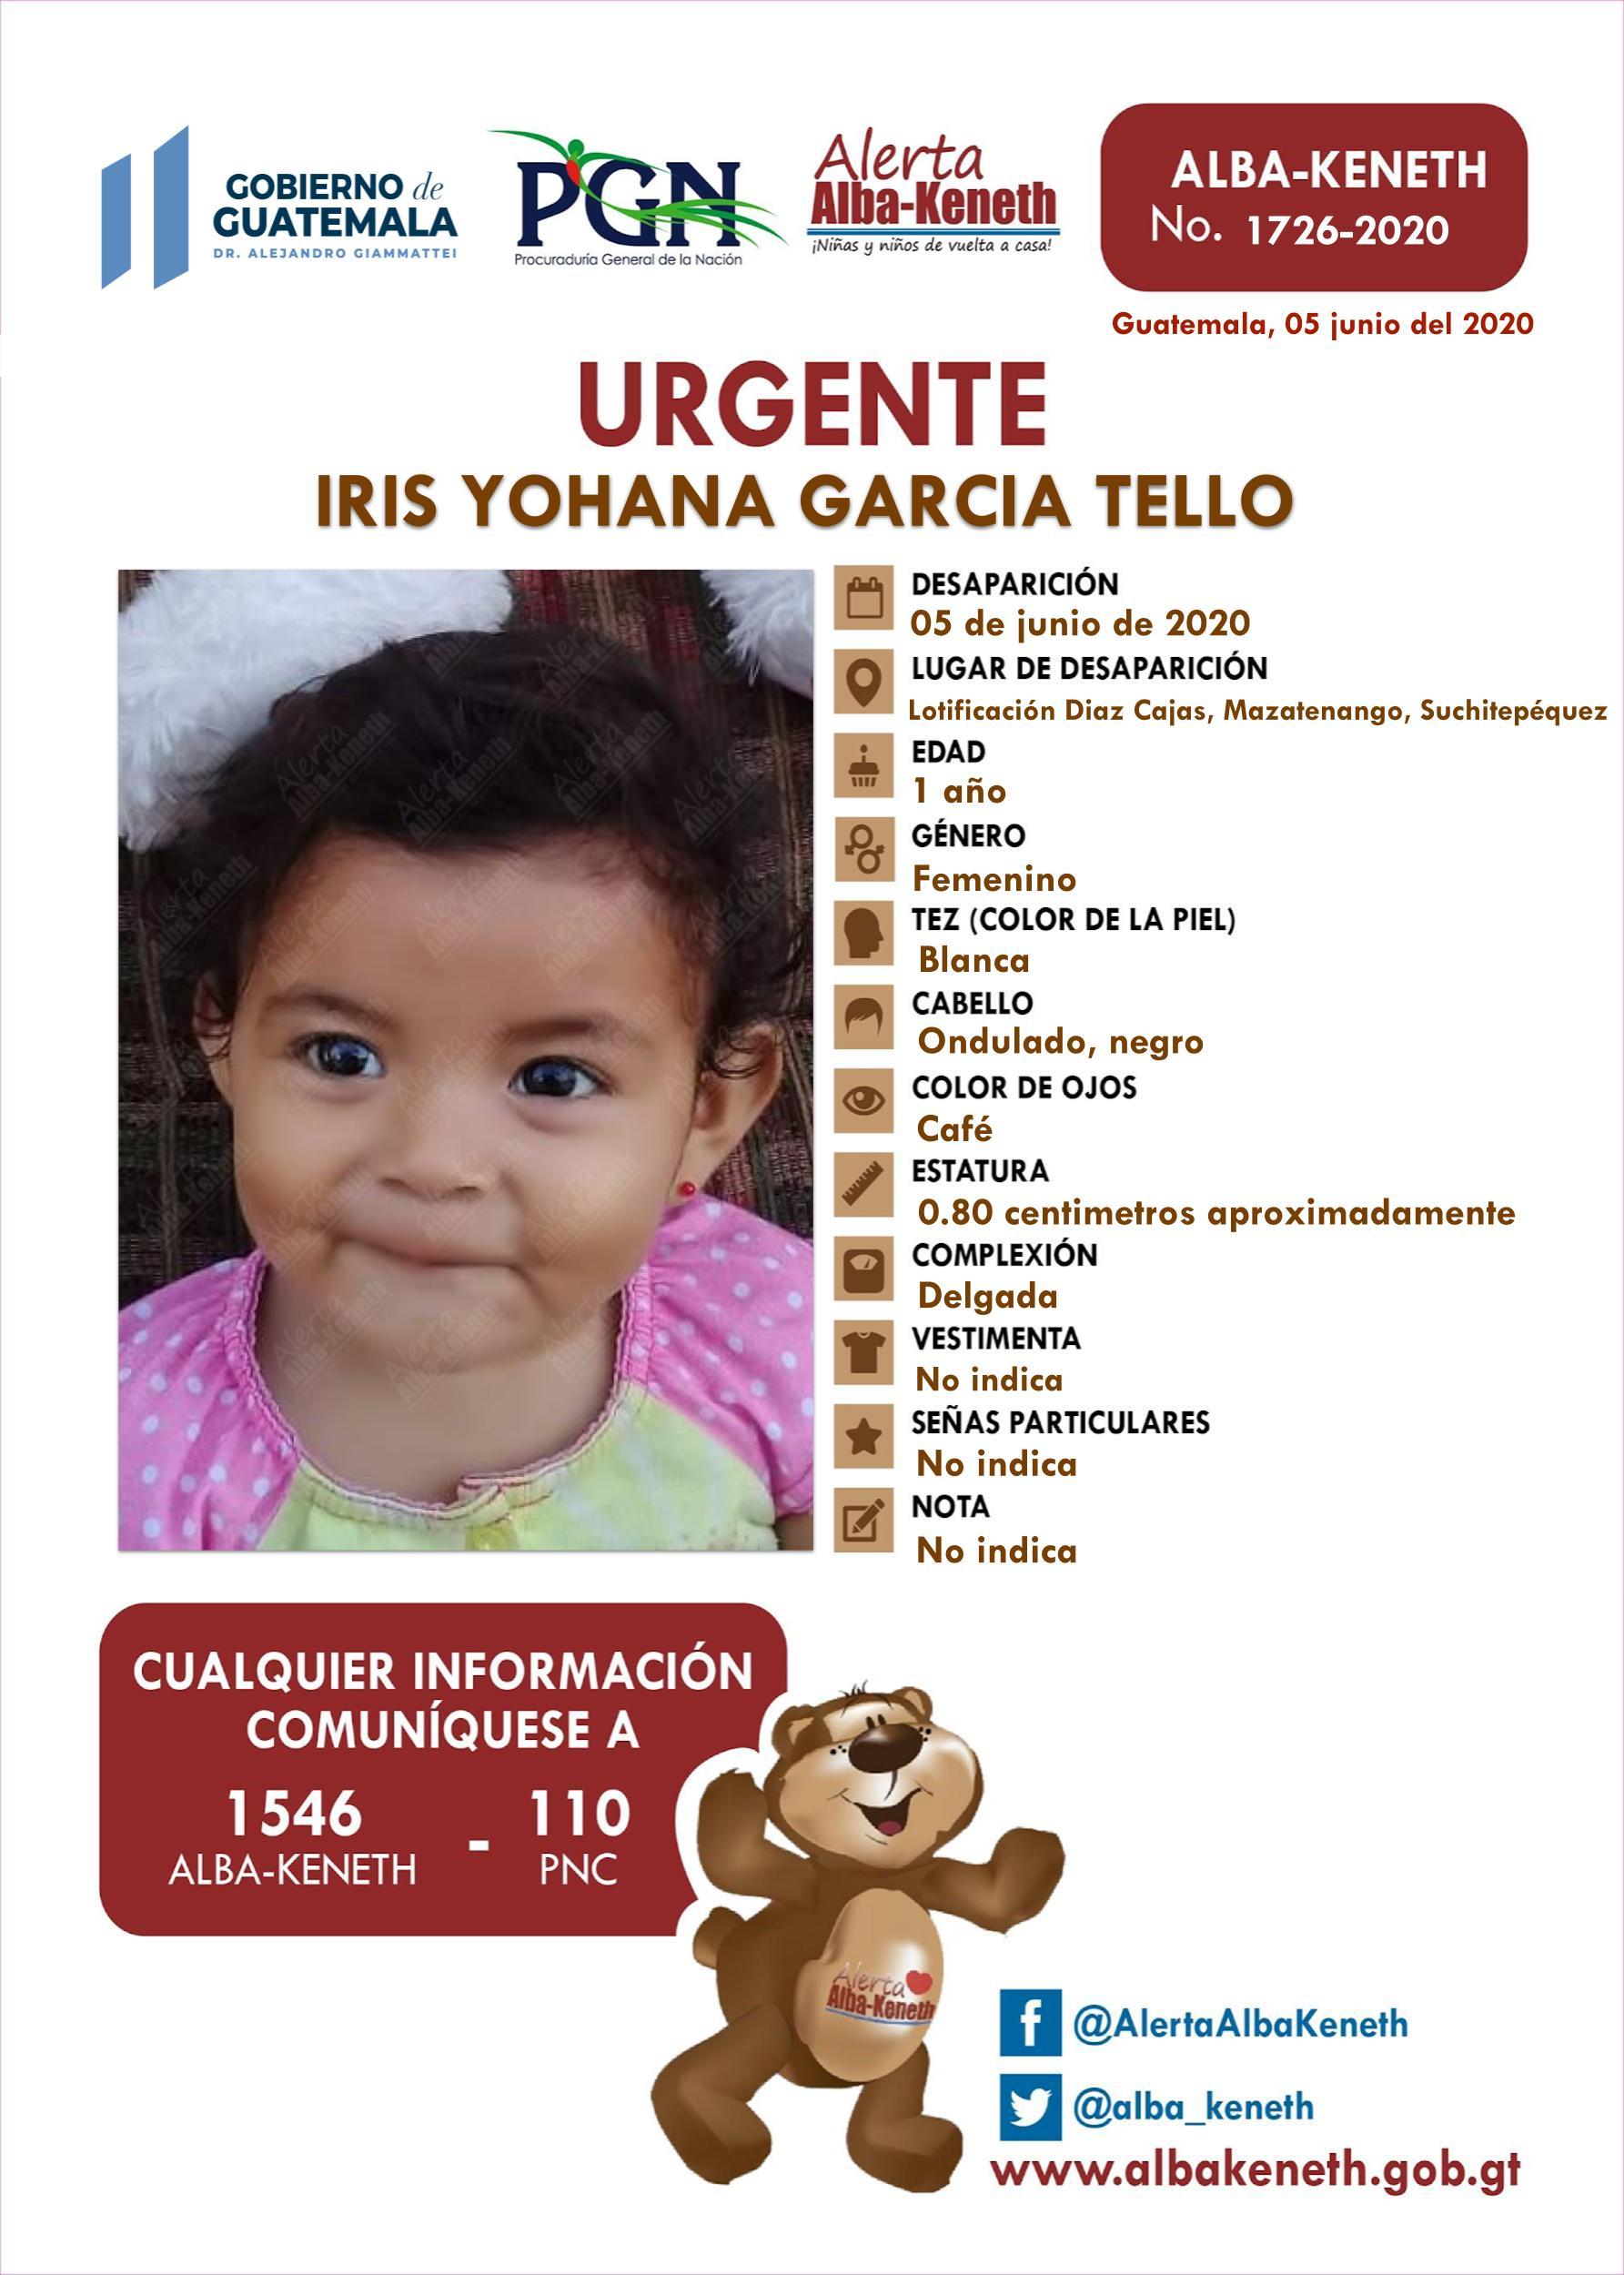 Iris Yohana Garcia Tello